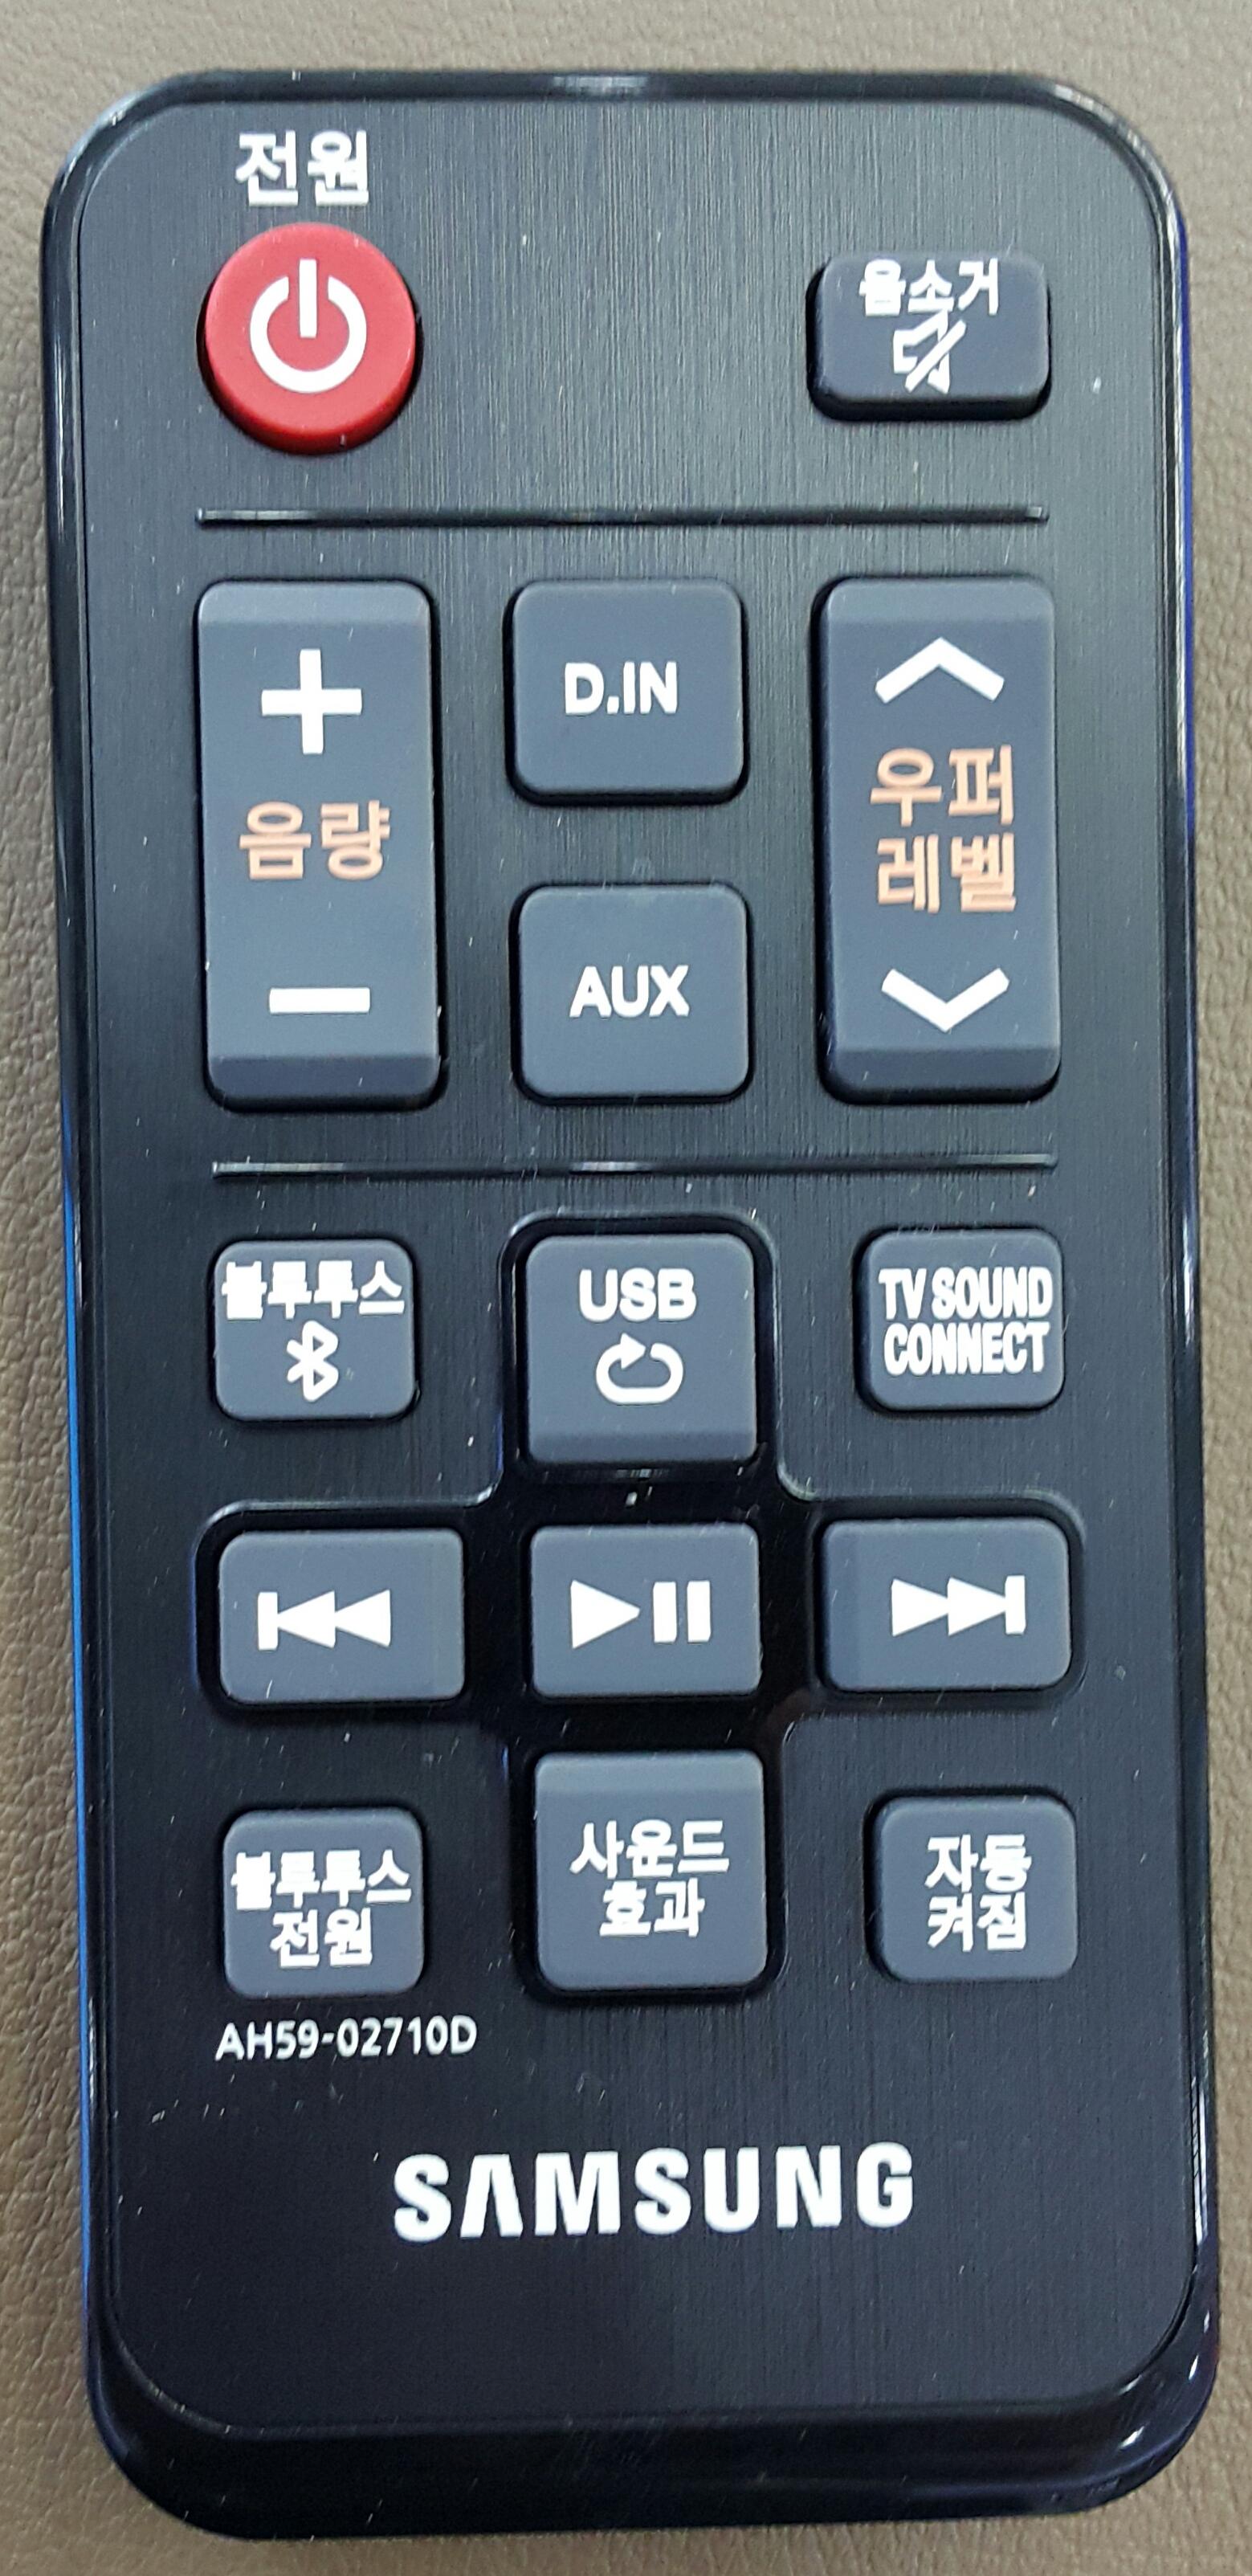 SAMSUNG AH59-02710D.jpg